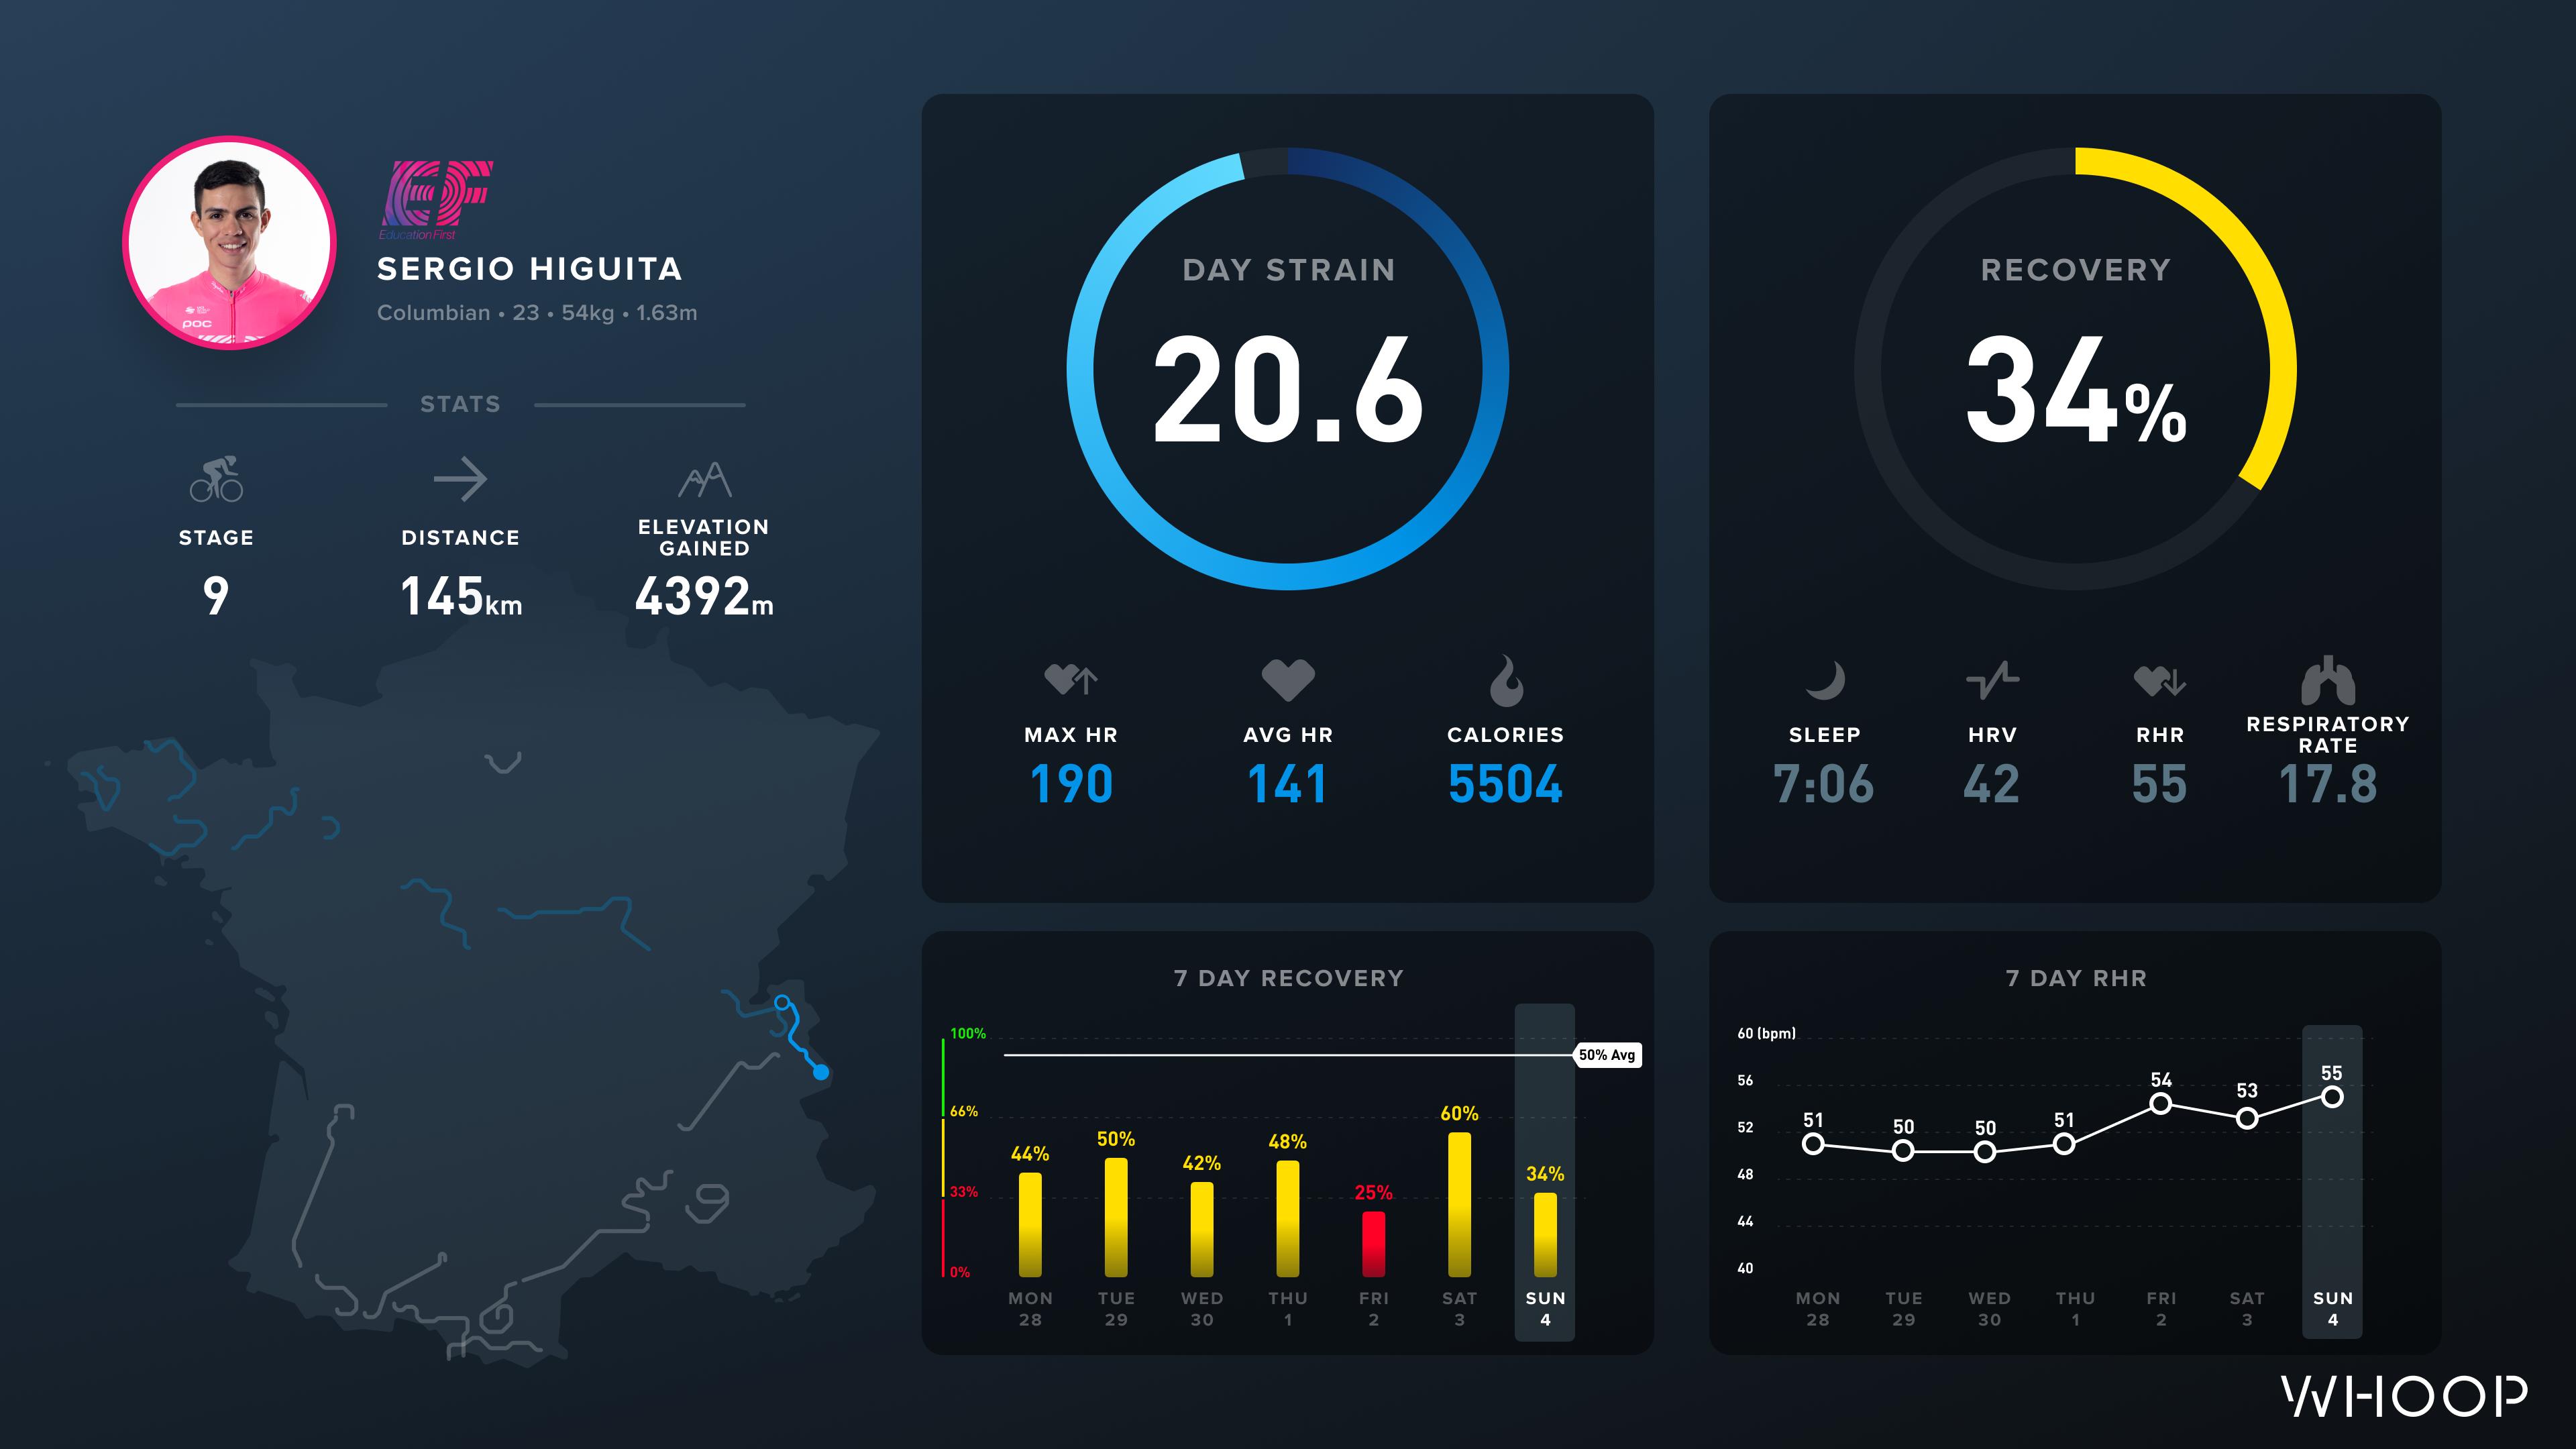 Sergio Higuita's WHOOP data